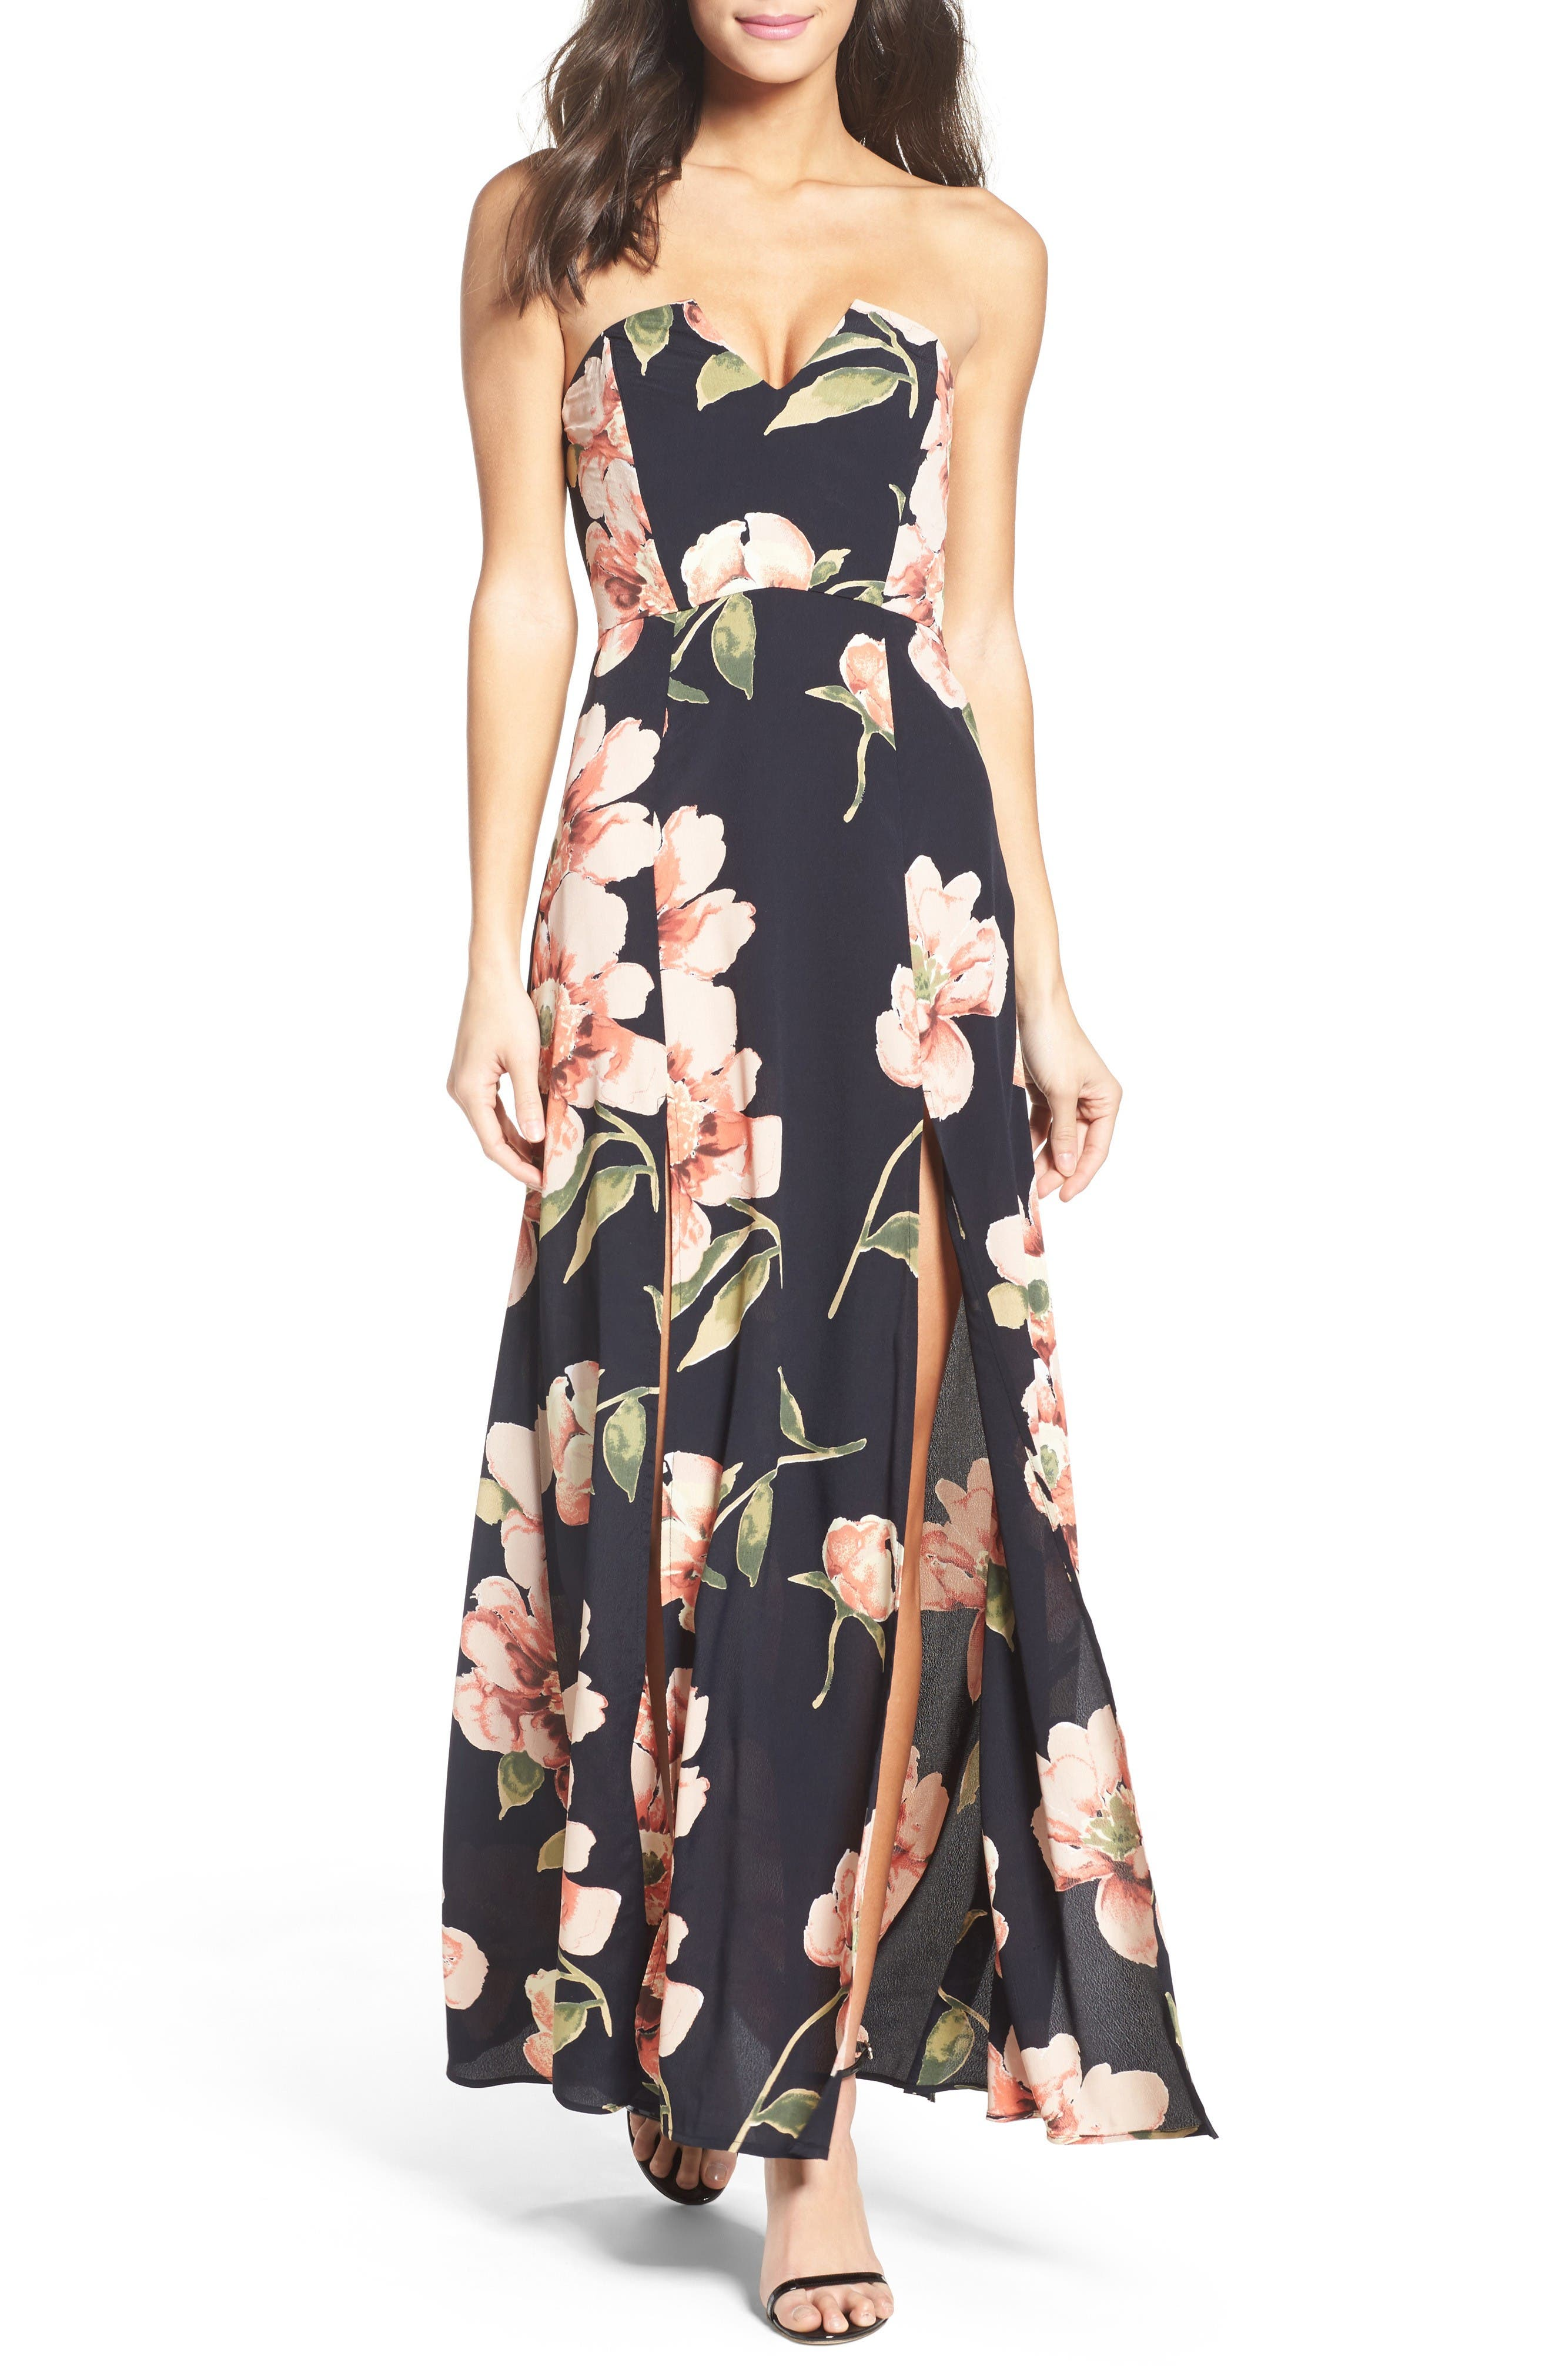 Roe + May Luca Crepe Dress